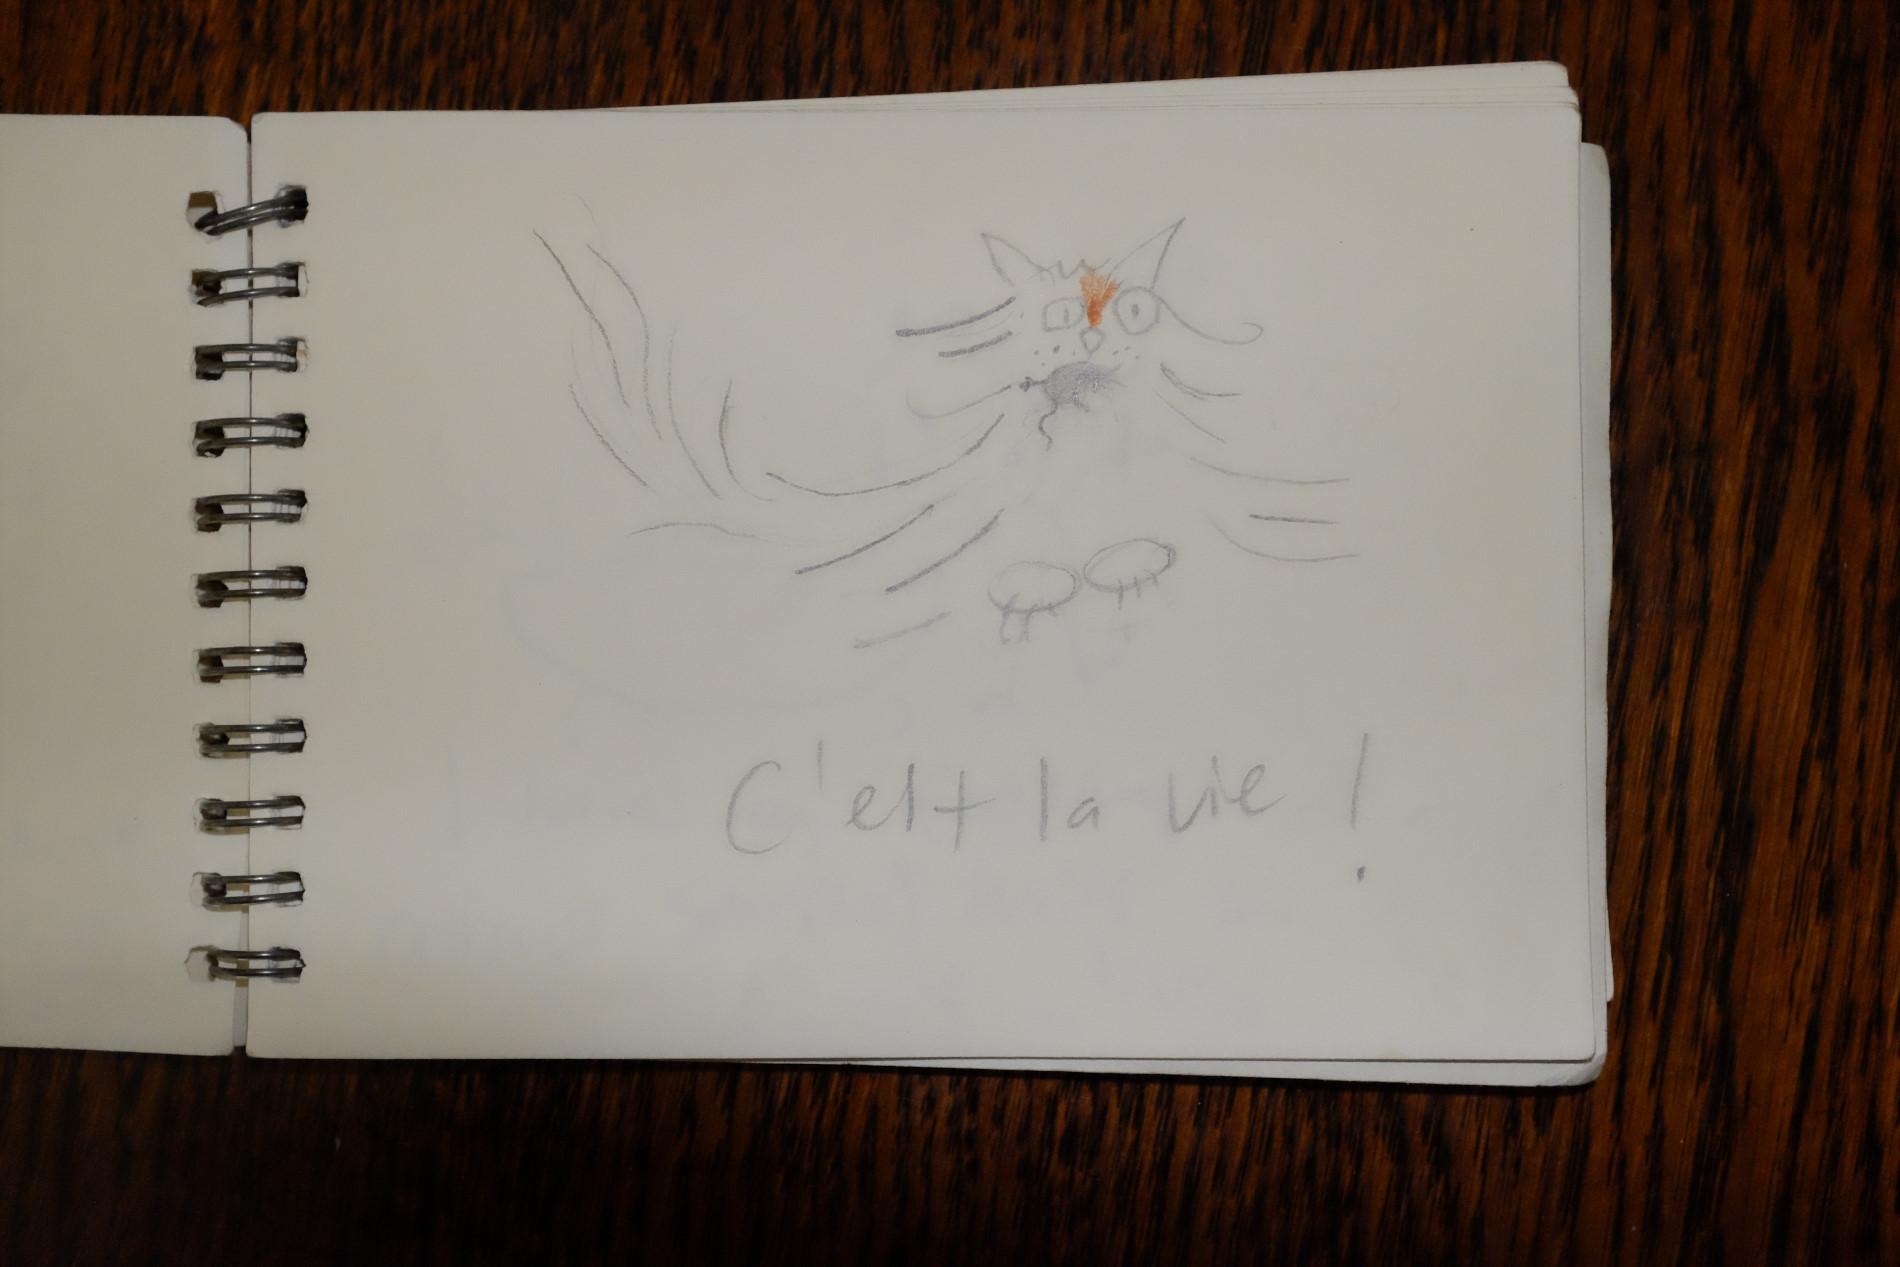 drawings-french diary-c'est la vie!